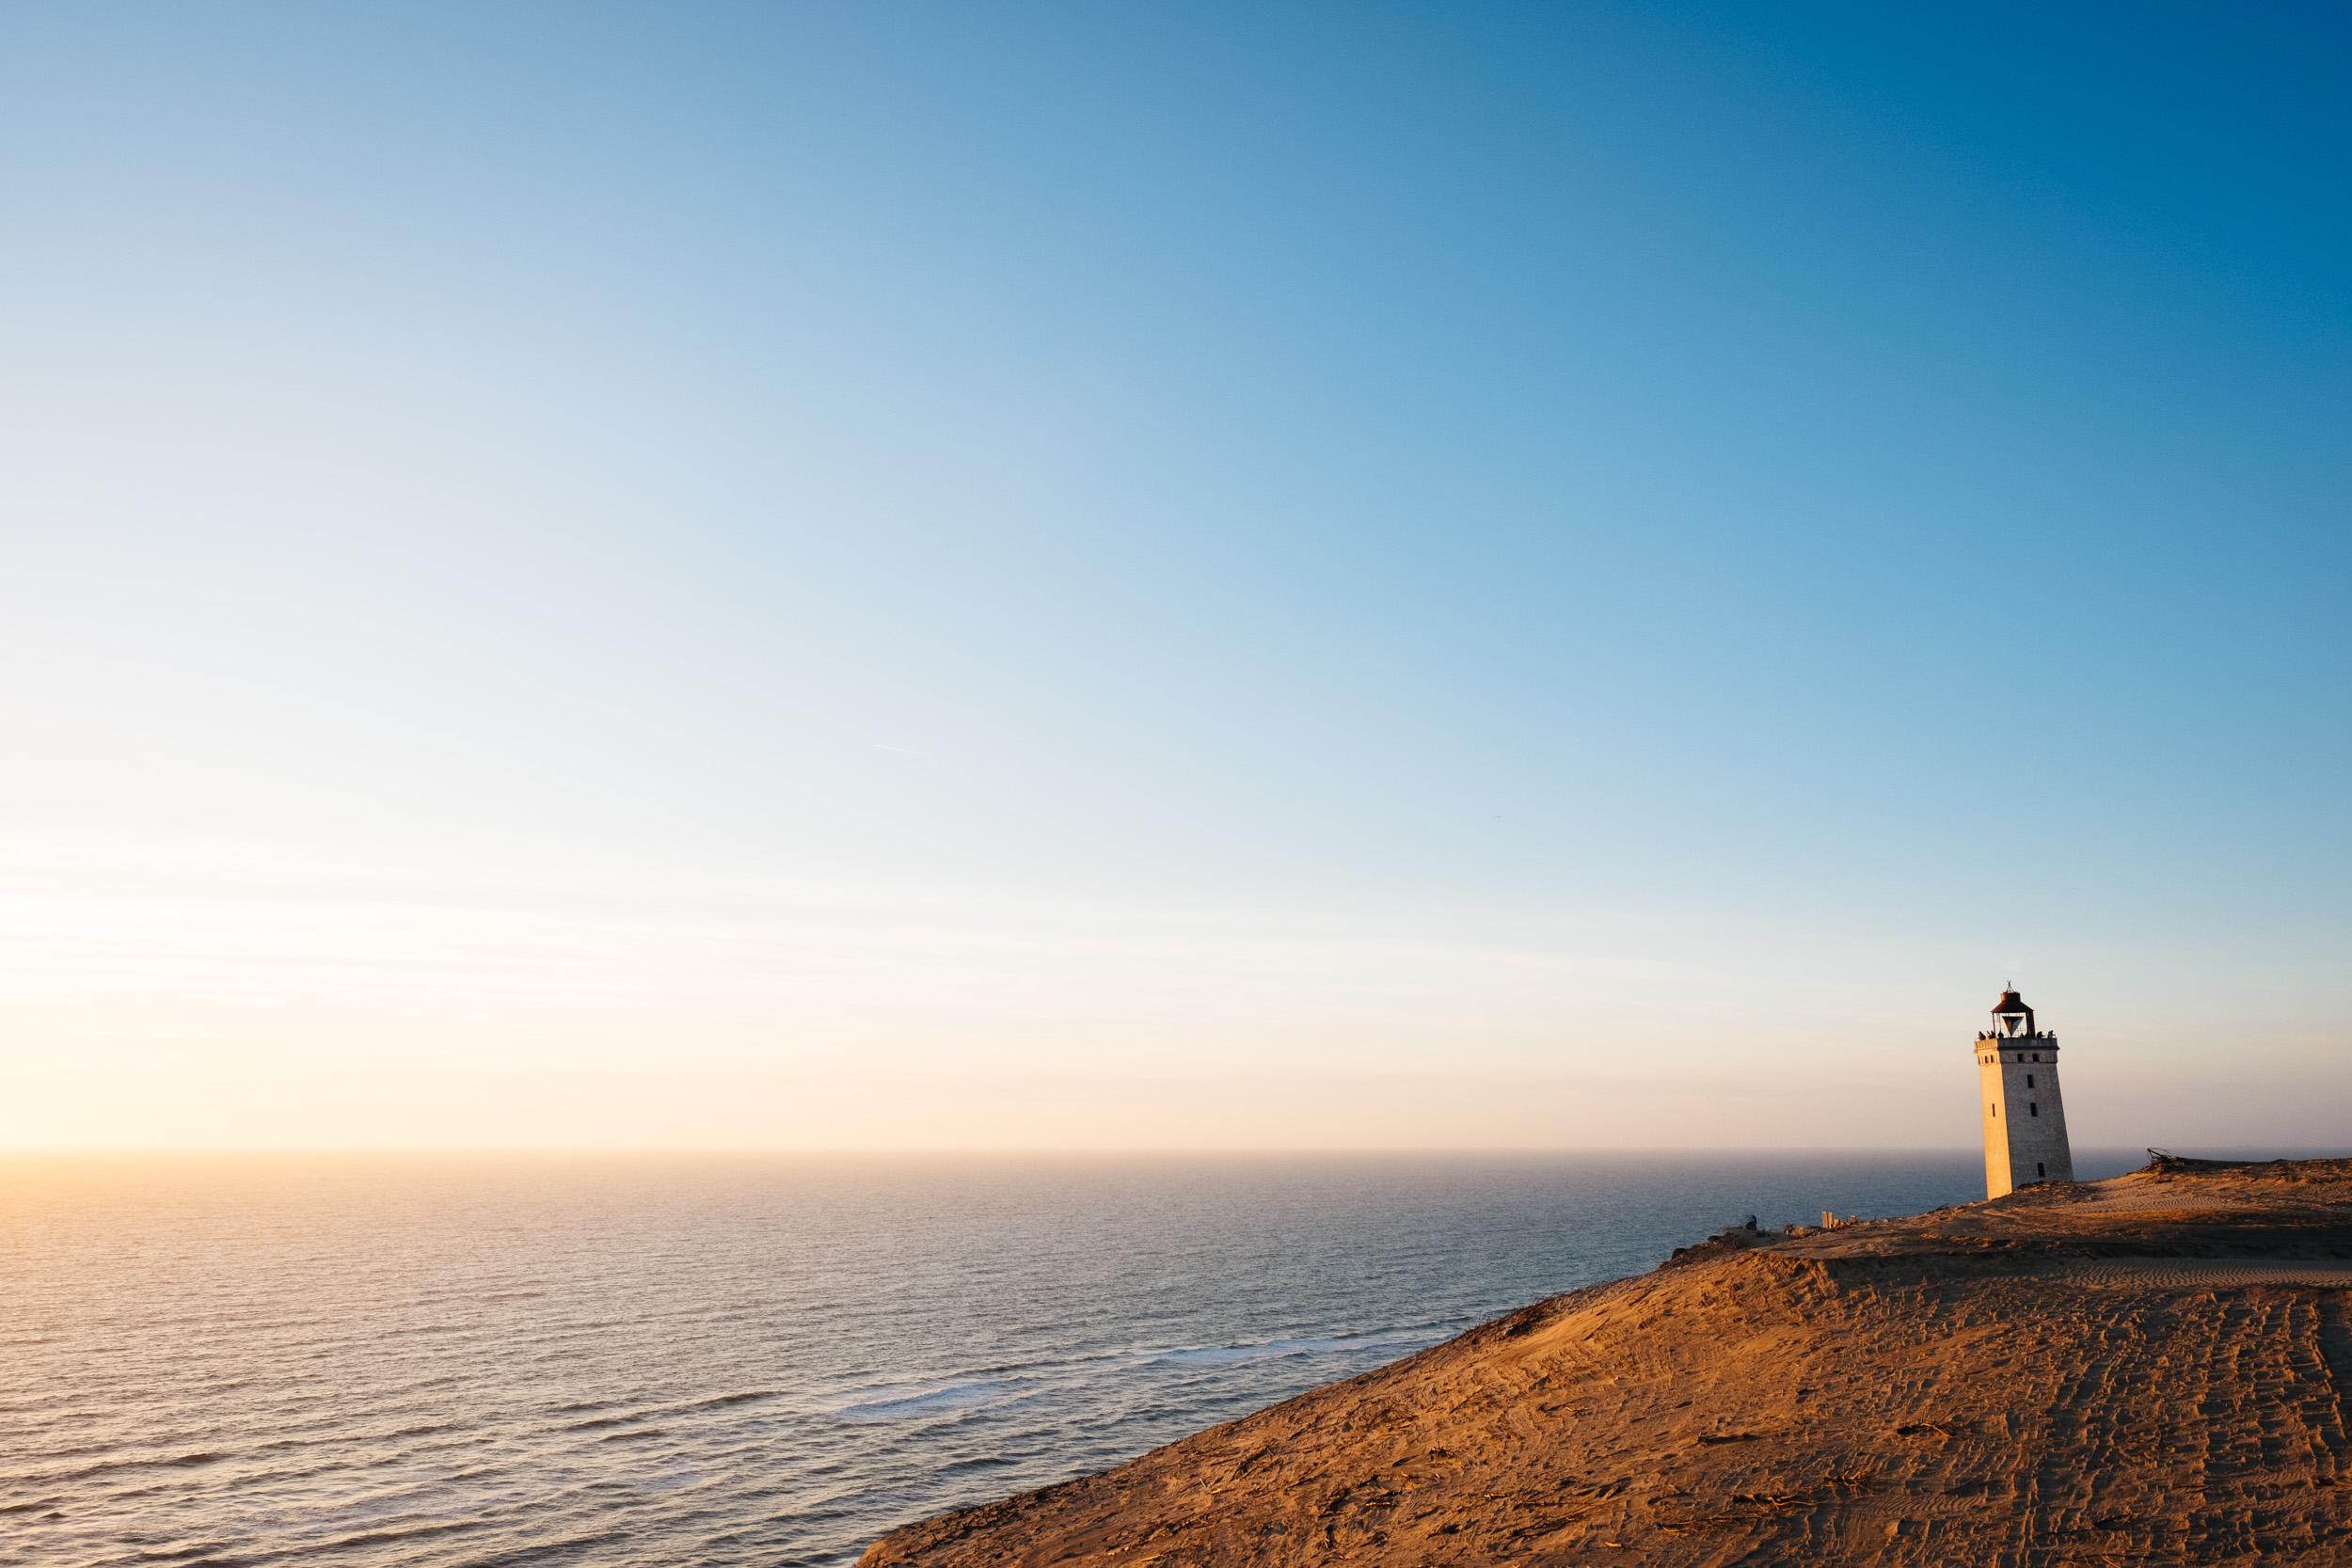 north sea, denmark